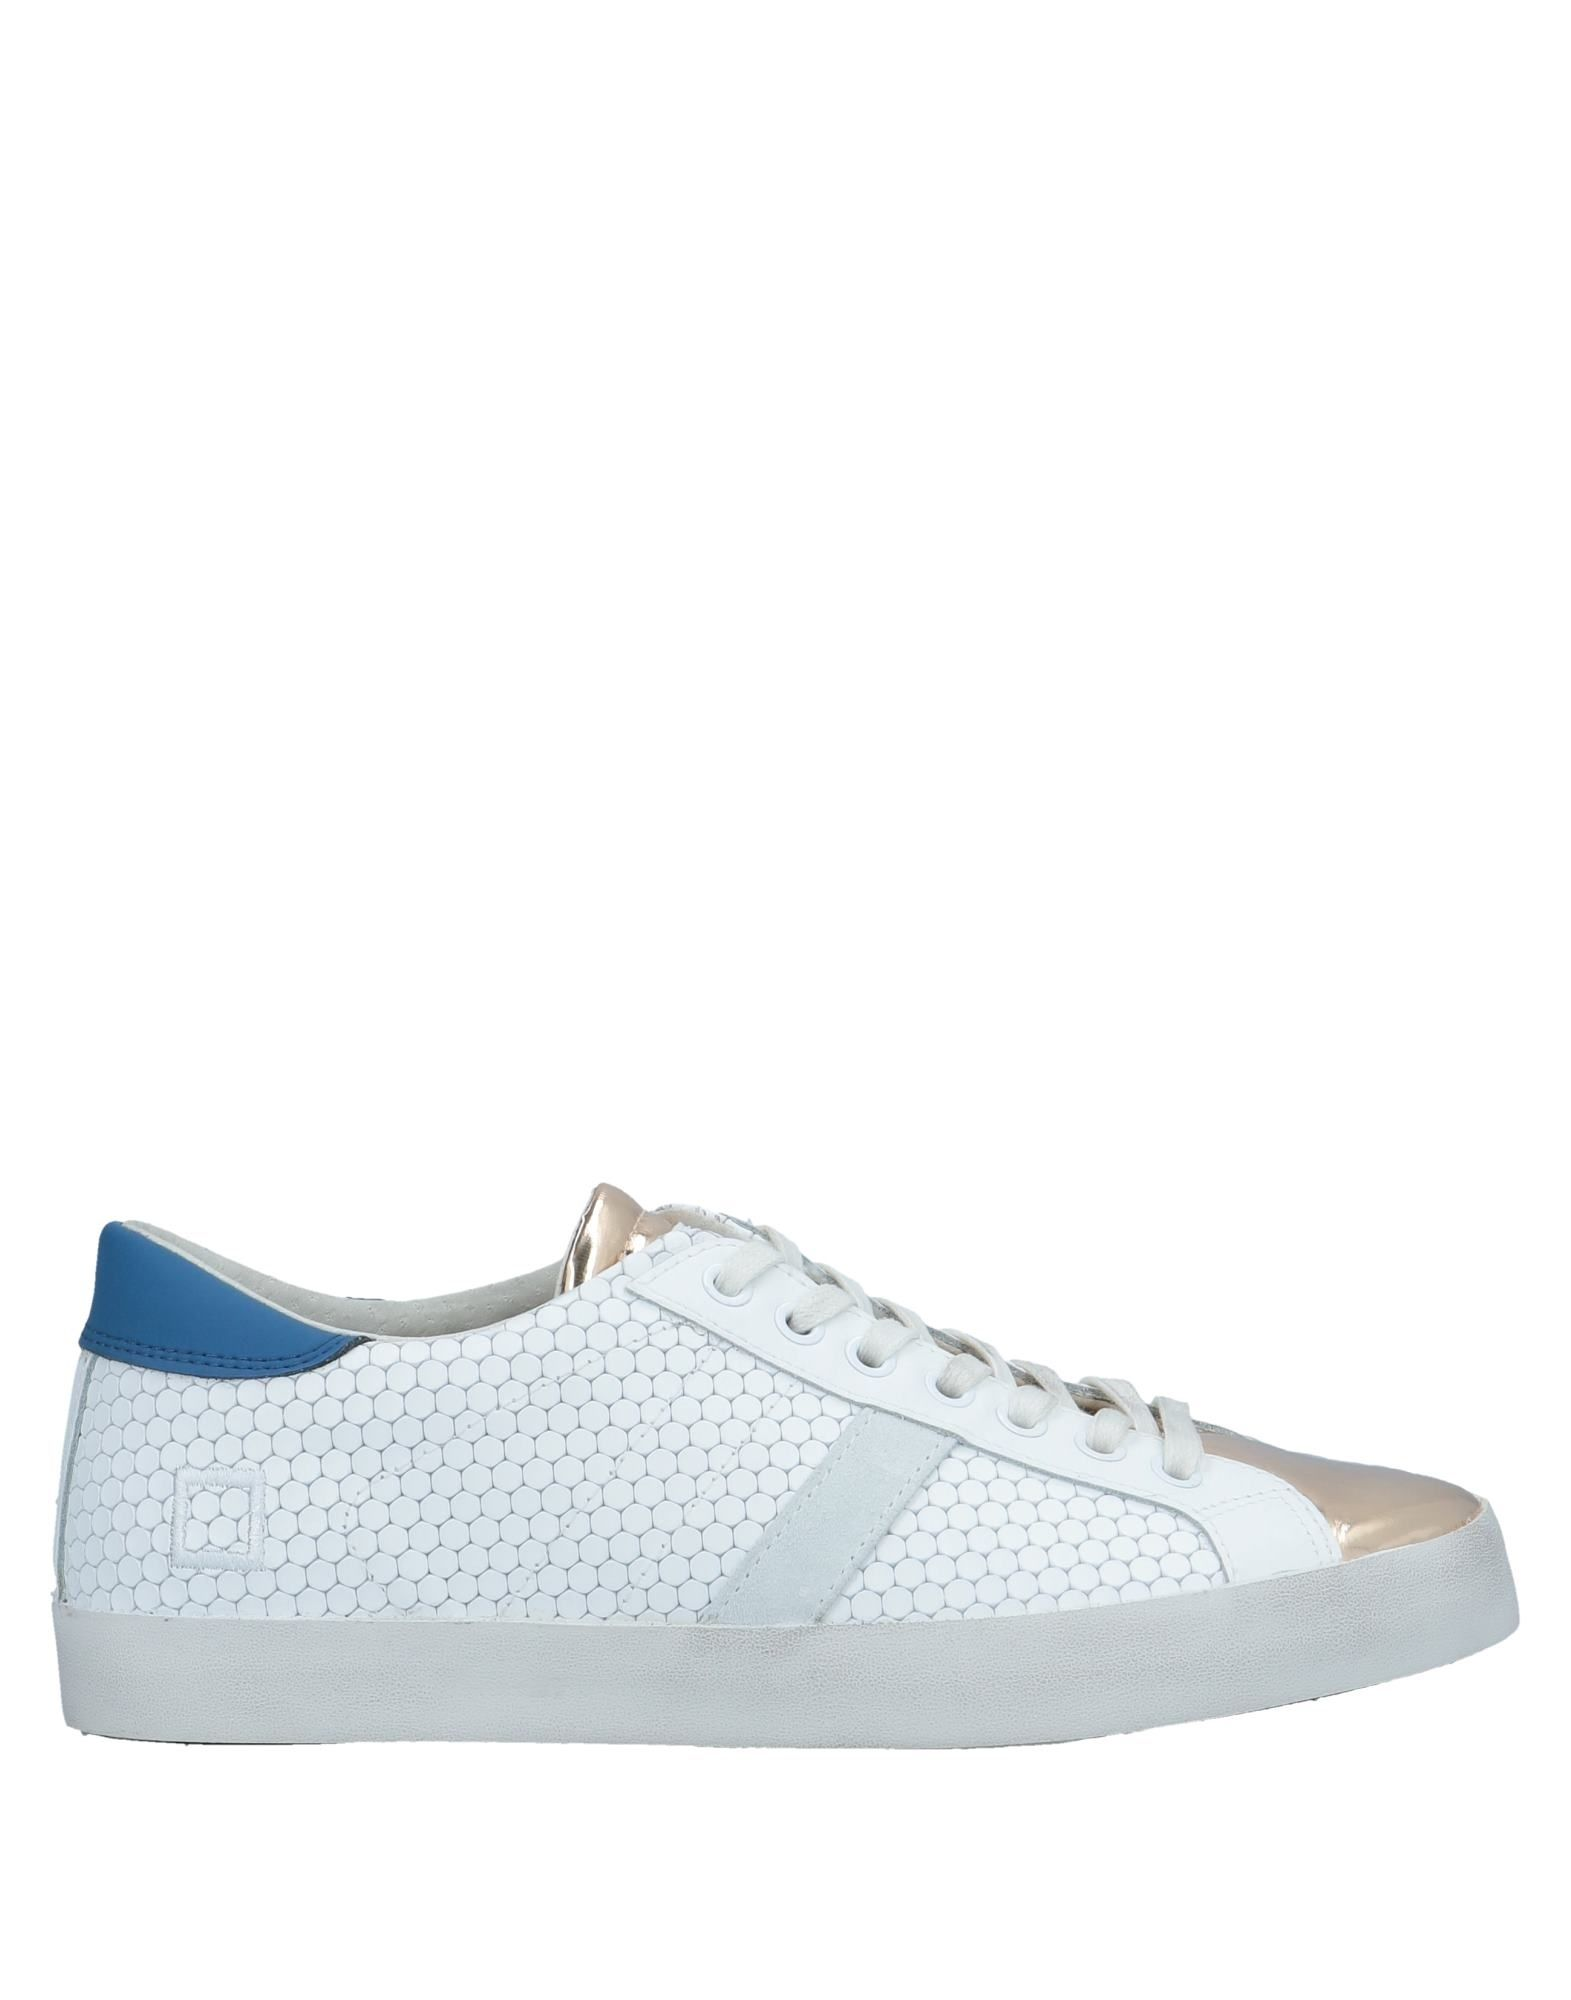 D.A.T.E. on Sneakers - Women D.A.T.E. Sneakers online on D.A.T.E.  Australia - 11554217TC 01415b